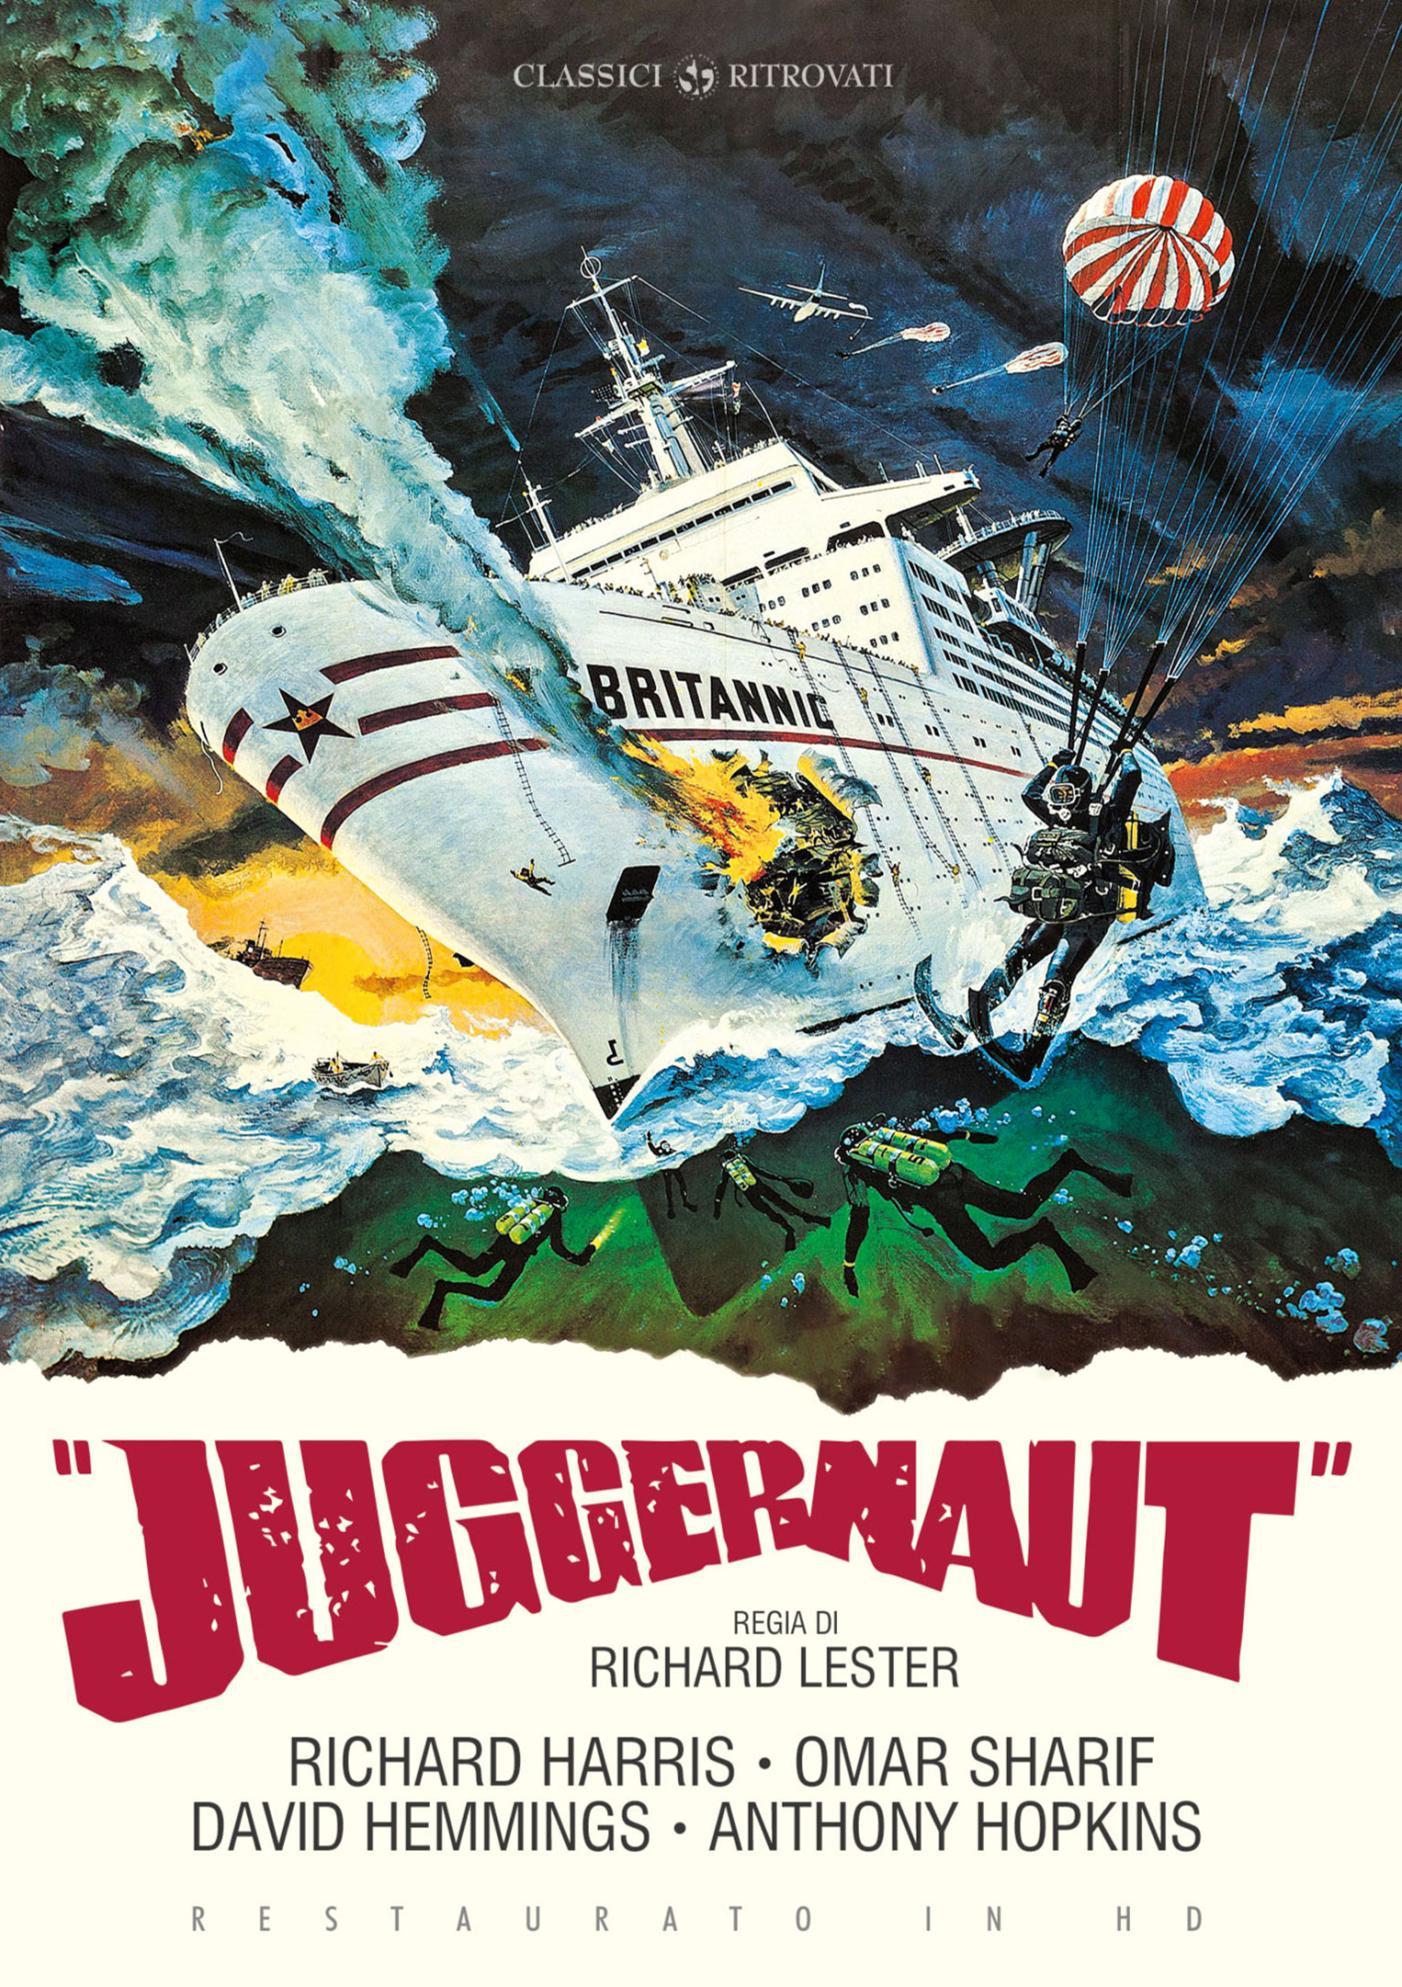 JUGGERNAUT (RESTAURATO IN HD) (DVD)